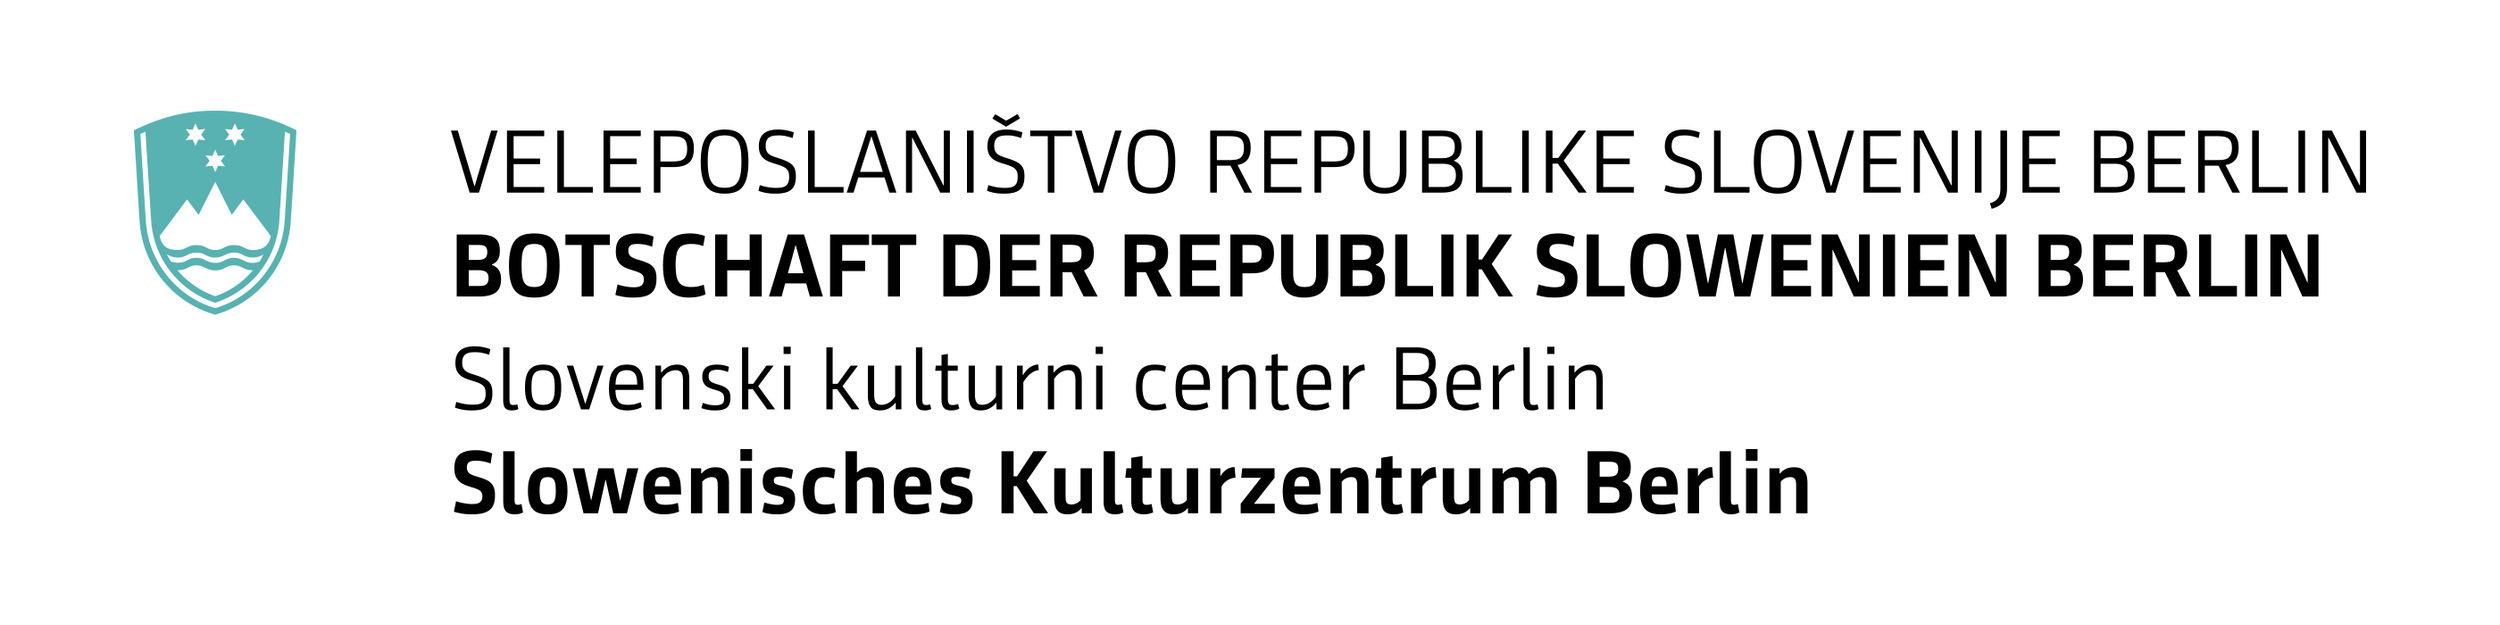 Projekt je finančno podprt s strani Veleposlaništva Republike Slovenije v Berlinu.